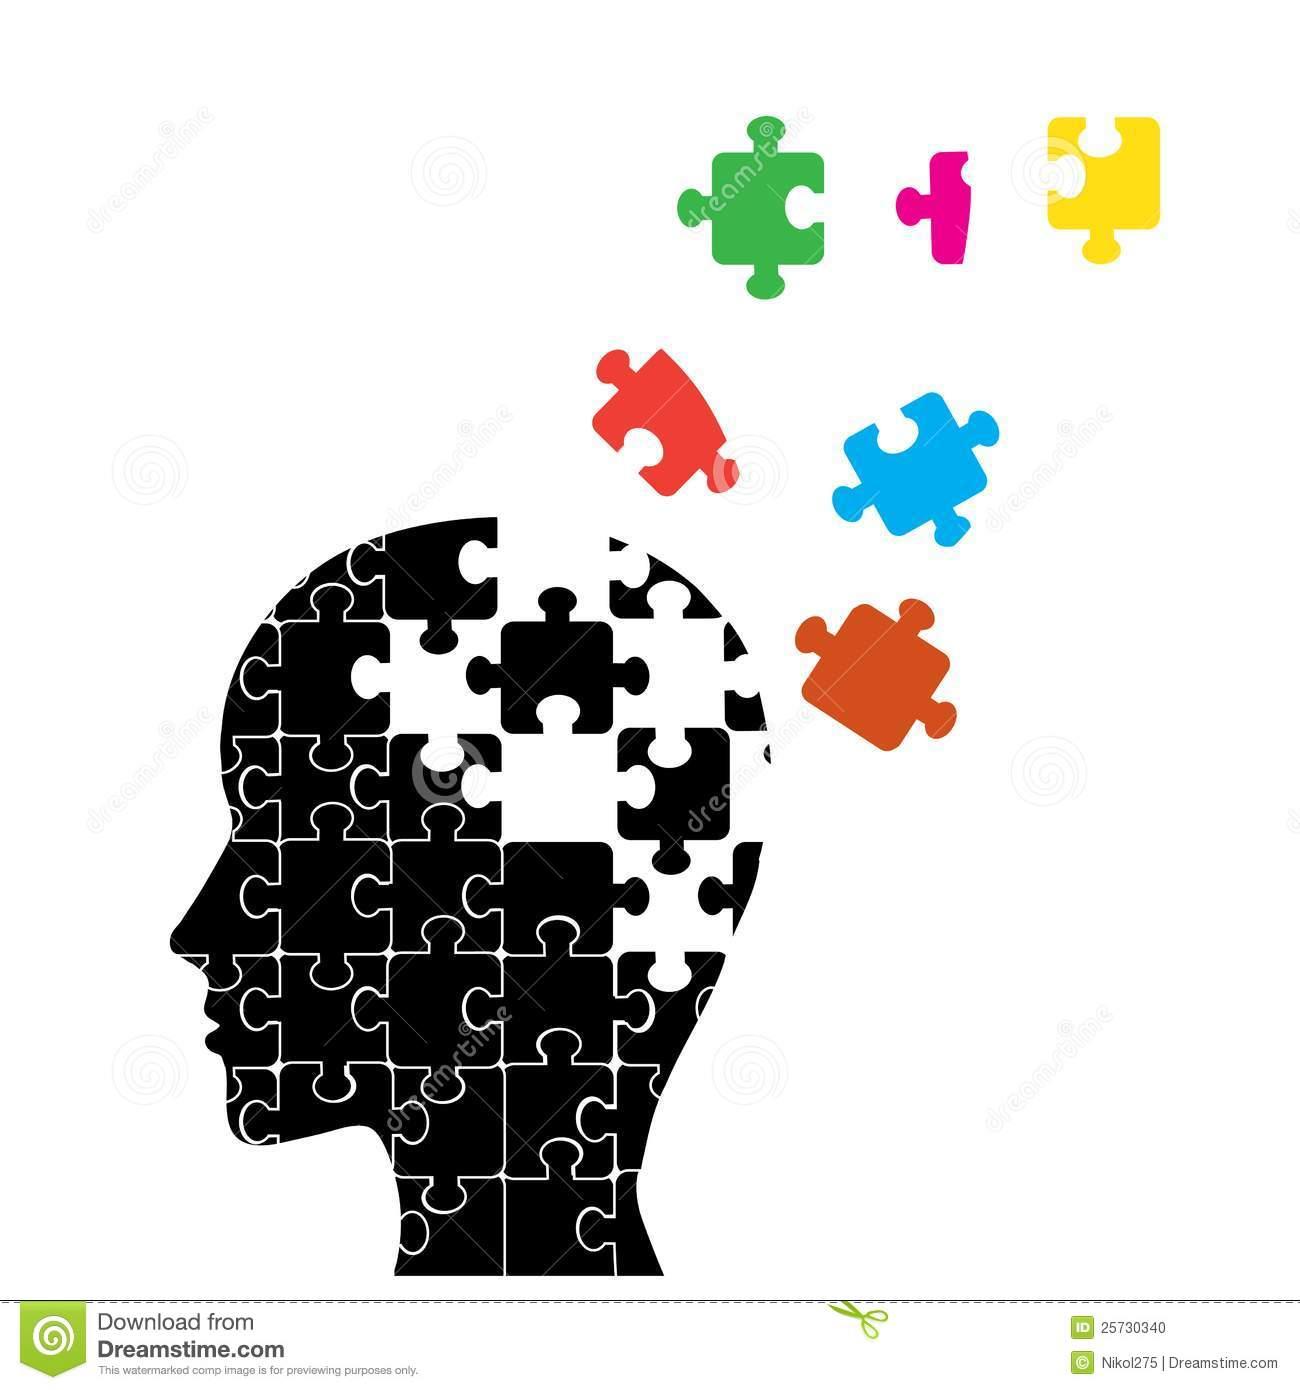 Gears clipart brain memory Brain memory memory loss Clipart